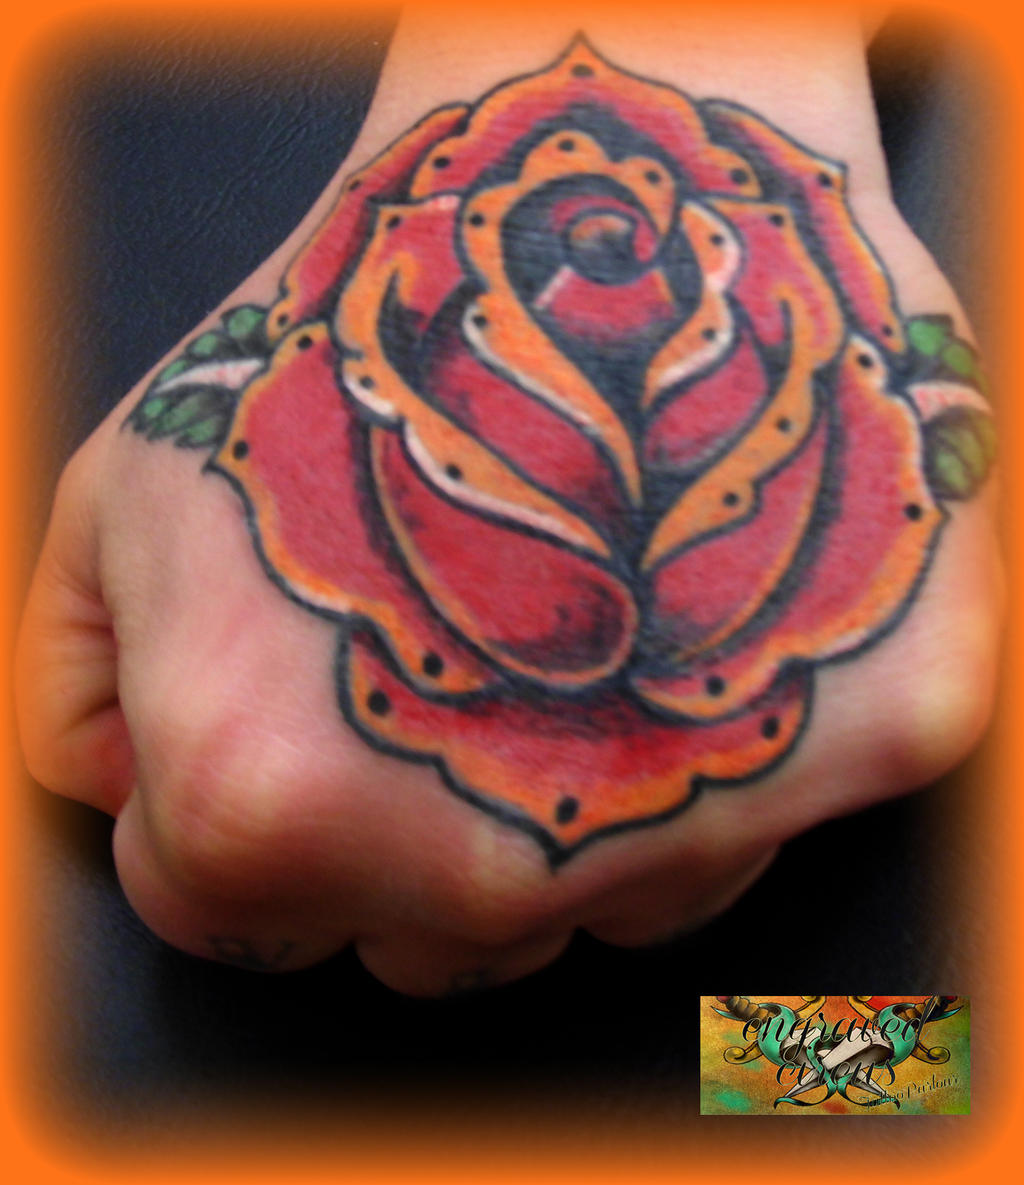 Rose Upper Hand by loop1974 on DeviantArt